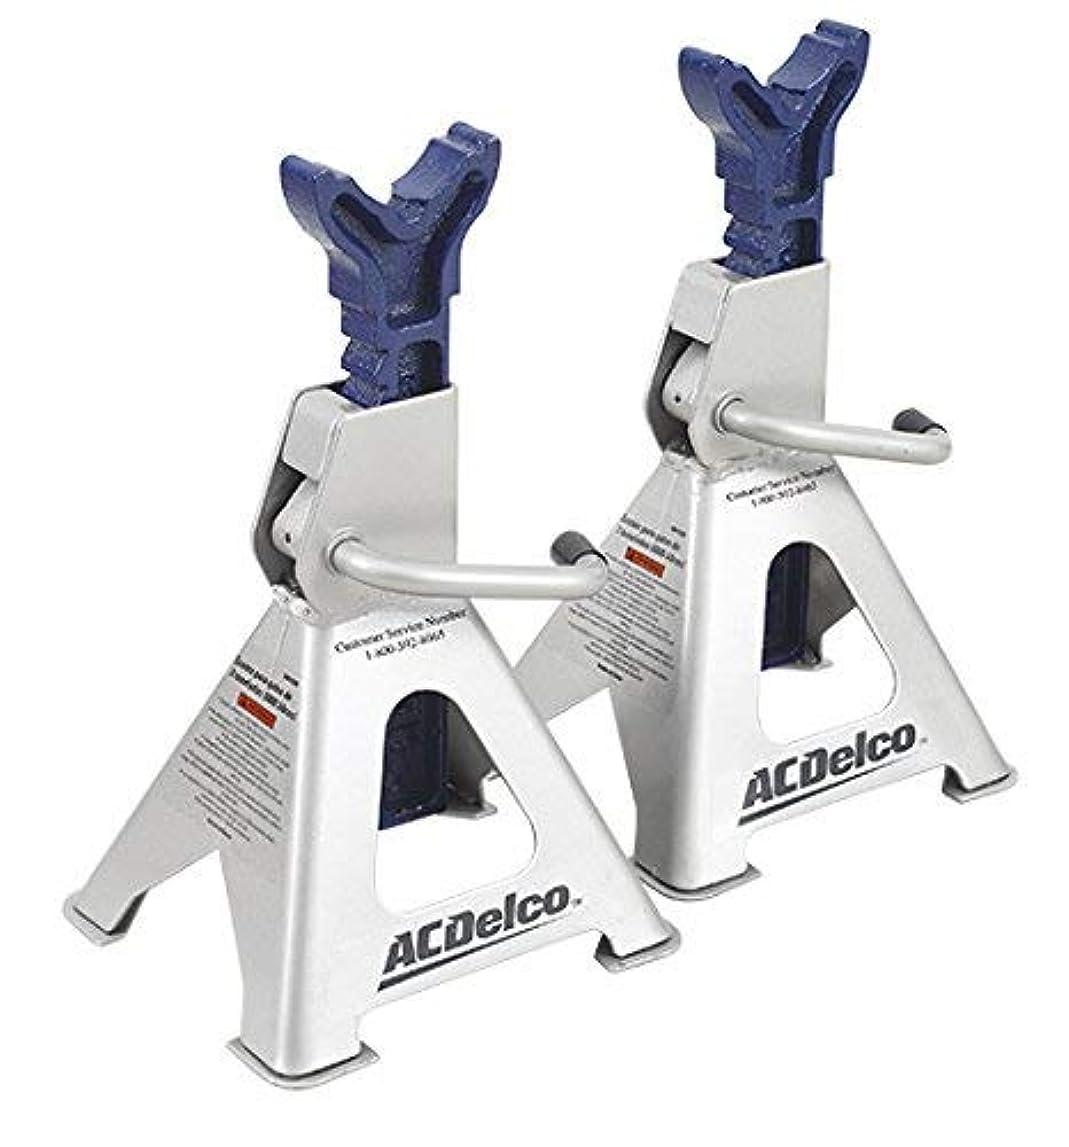 ACDelco 34124 Steel 3 Ton Capacity Jack Stand [並行輸入品]